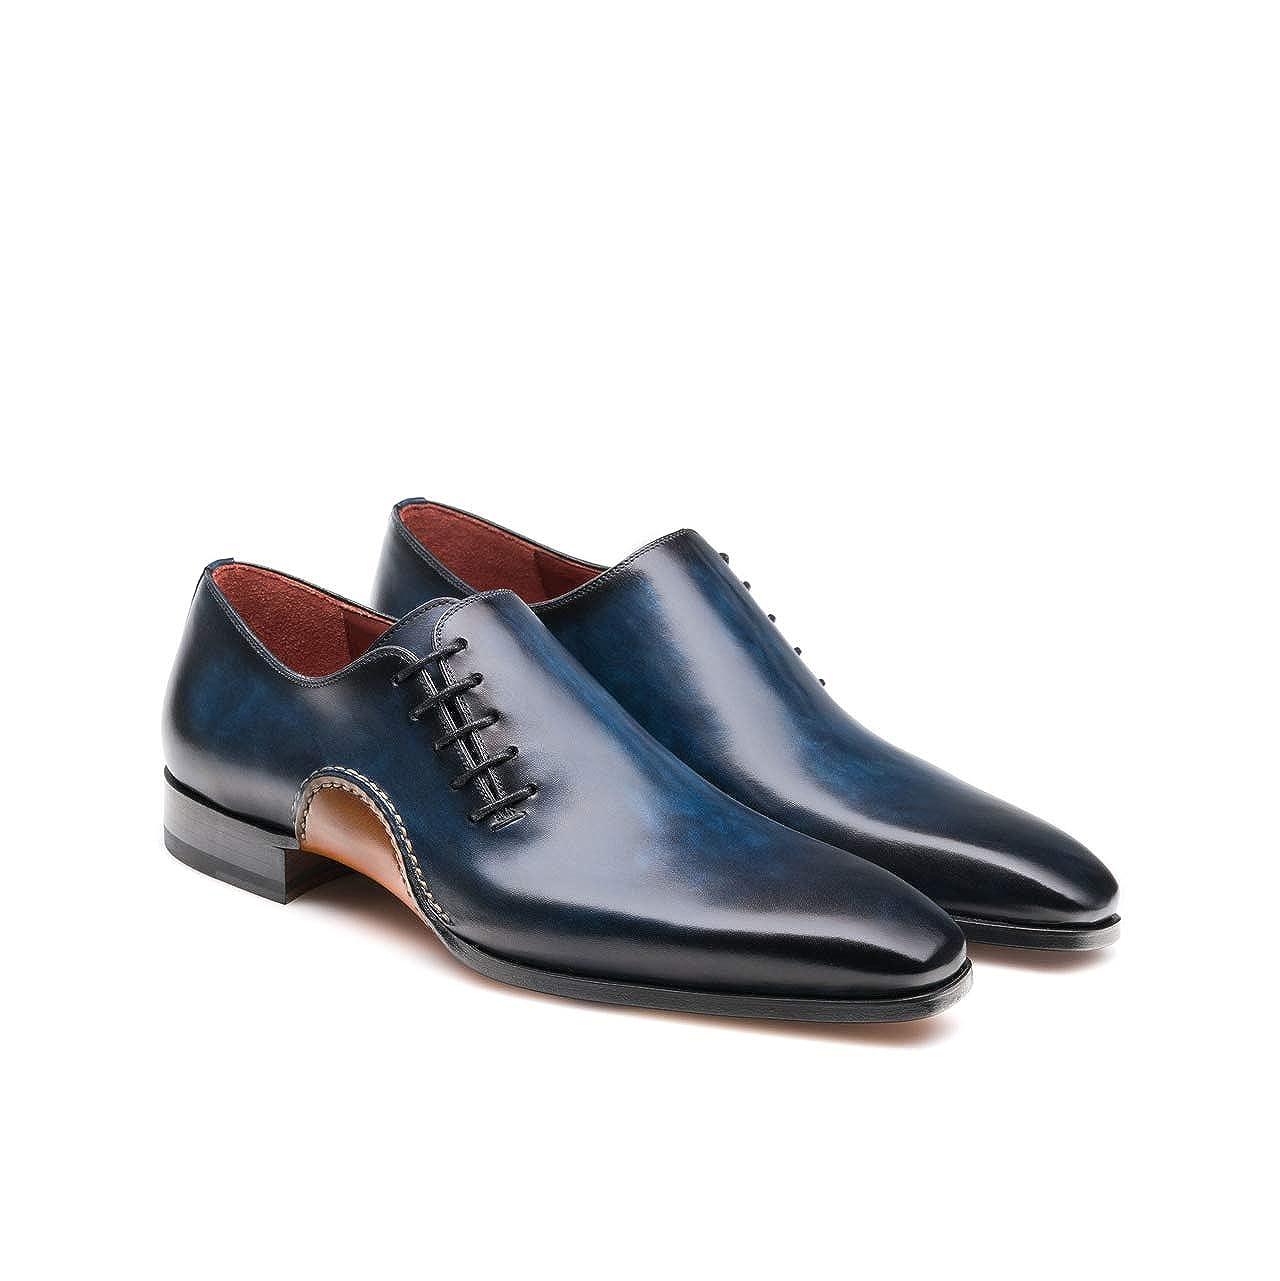 Wholecut Oxford Shoes for Men at Amazon